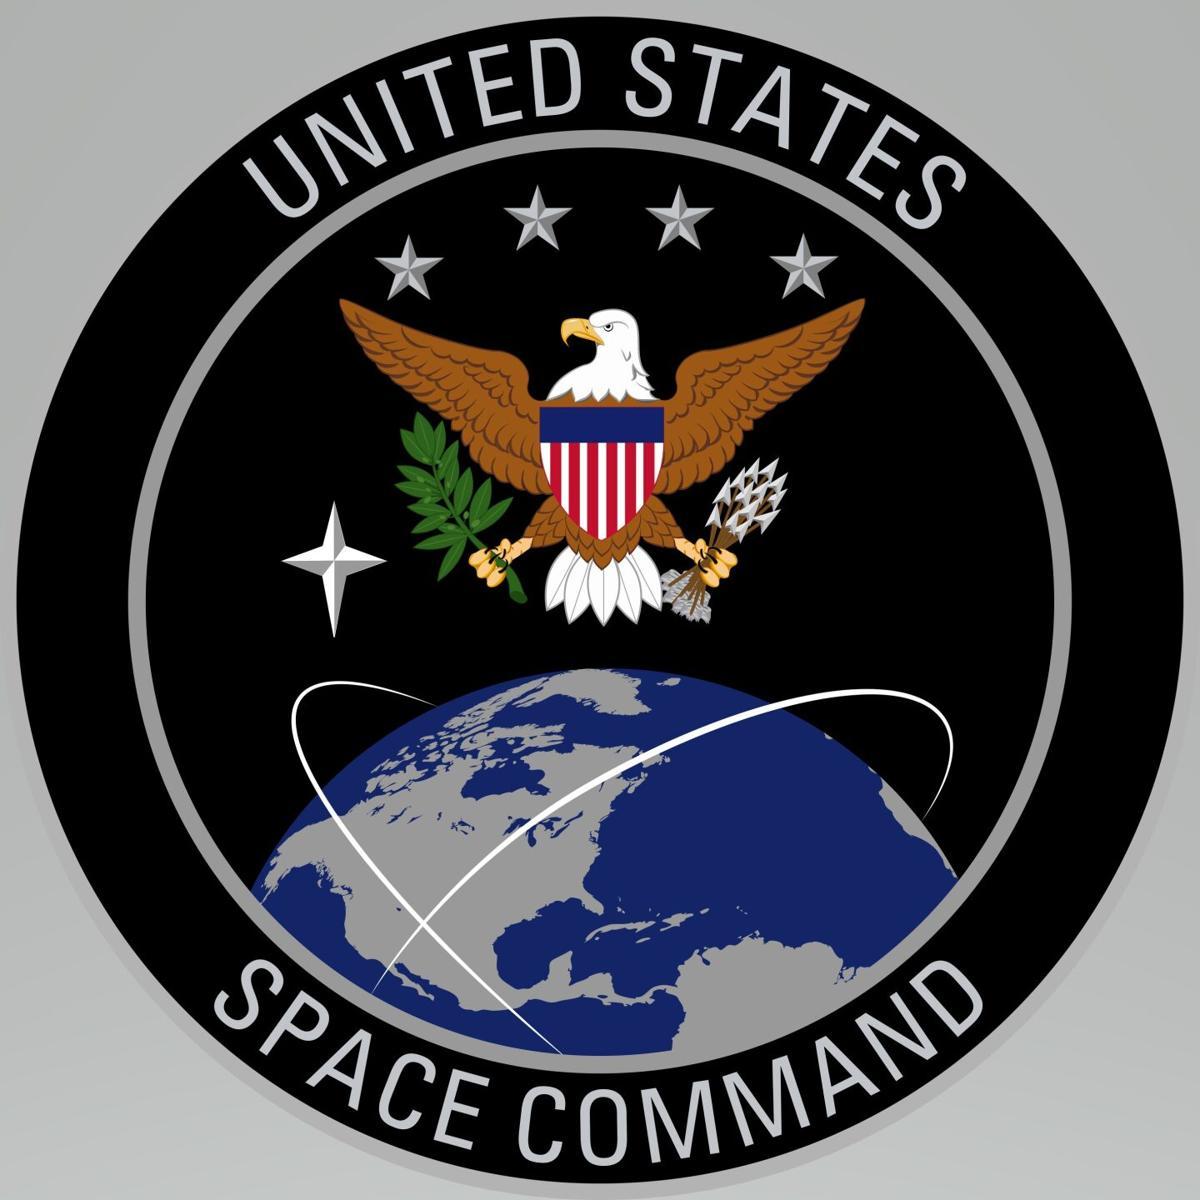 U.S. Space Command logo jpg version